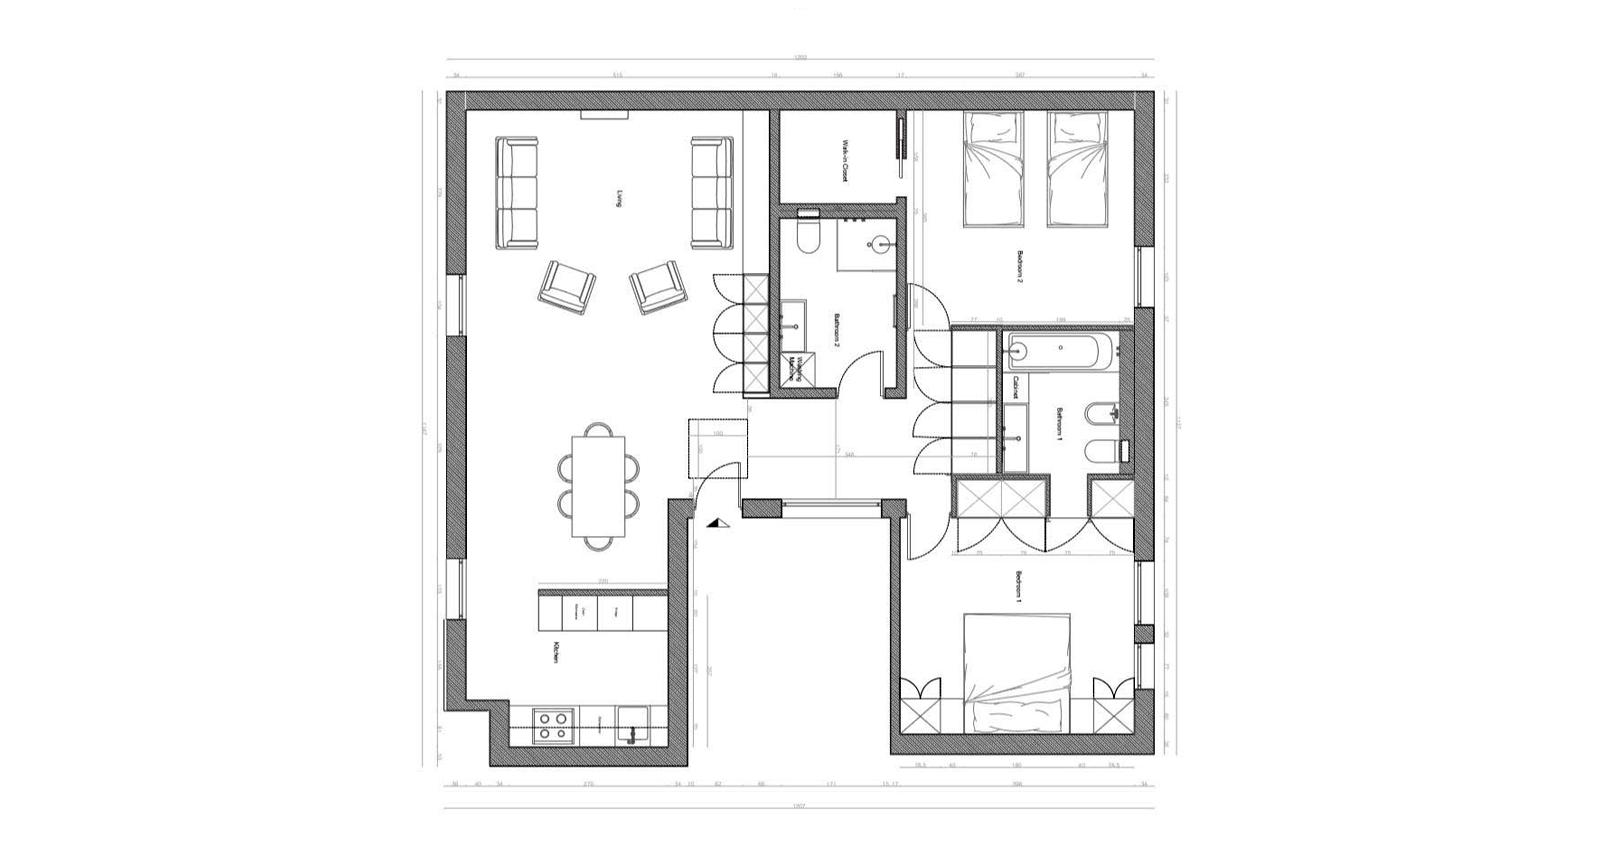 floor-plan-ok-bolton.jpg